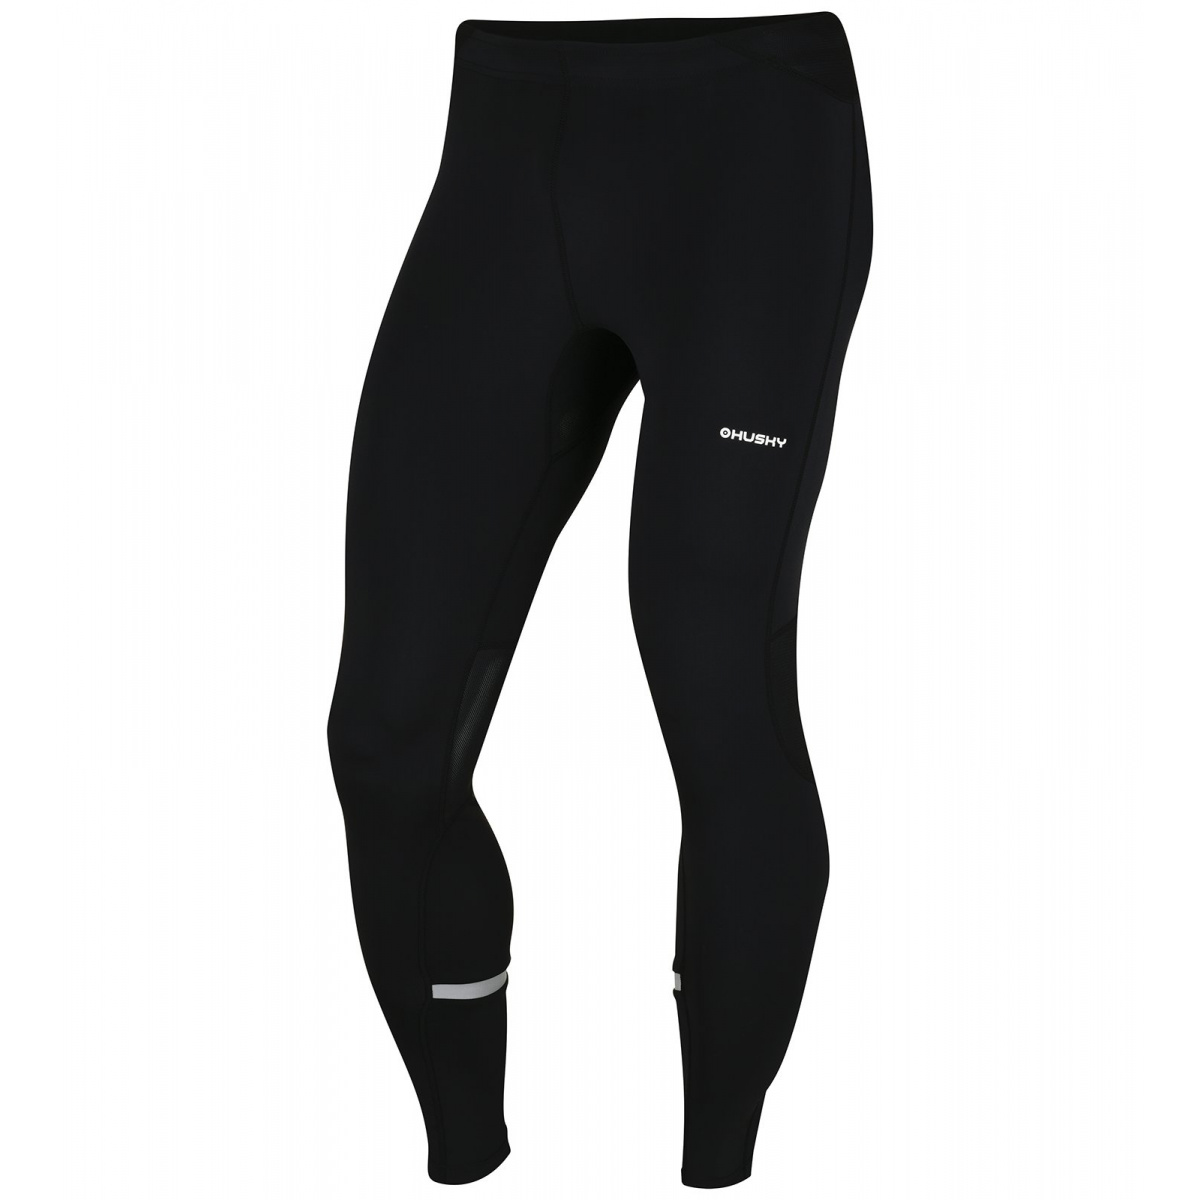 2badf4bd55ec Pánske športové nohavice – Darby Long M. Darby Long M